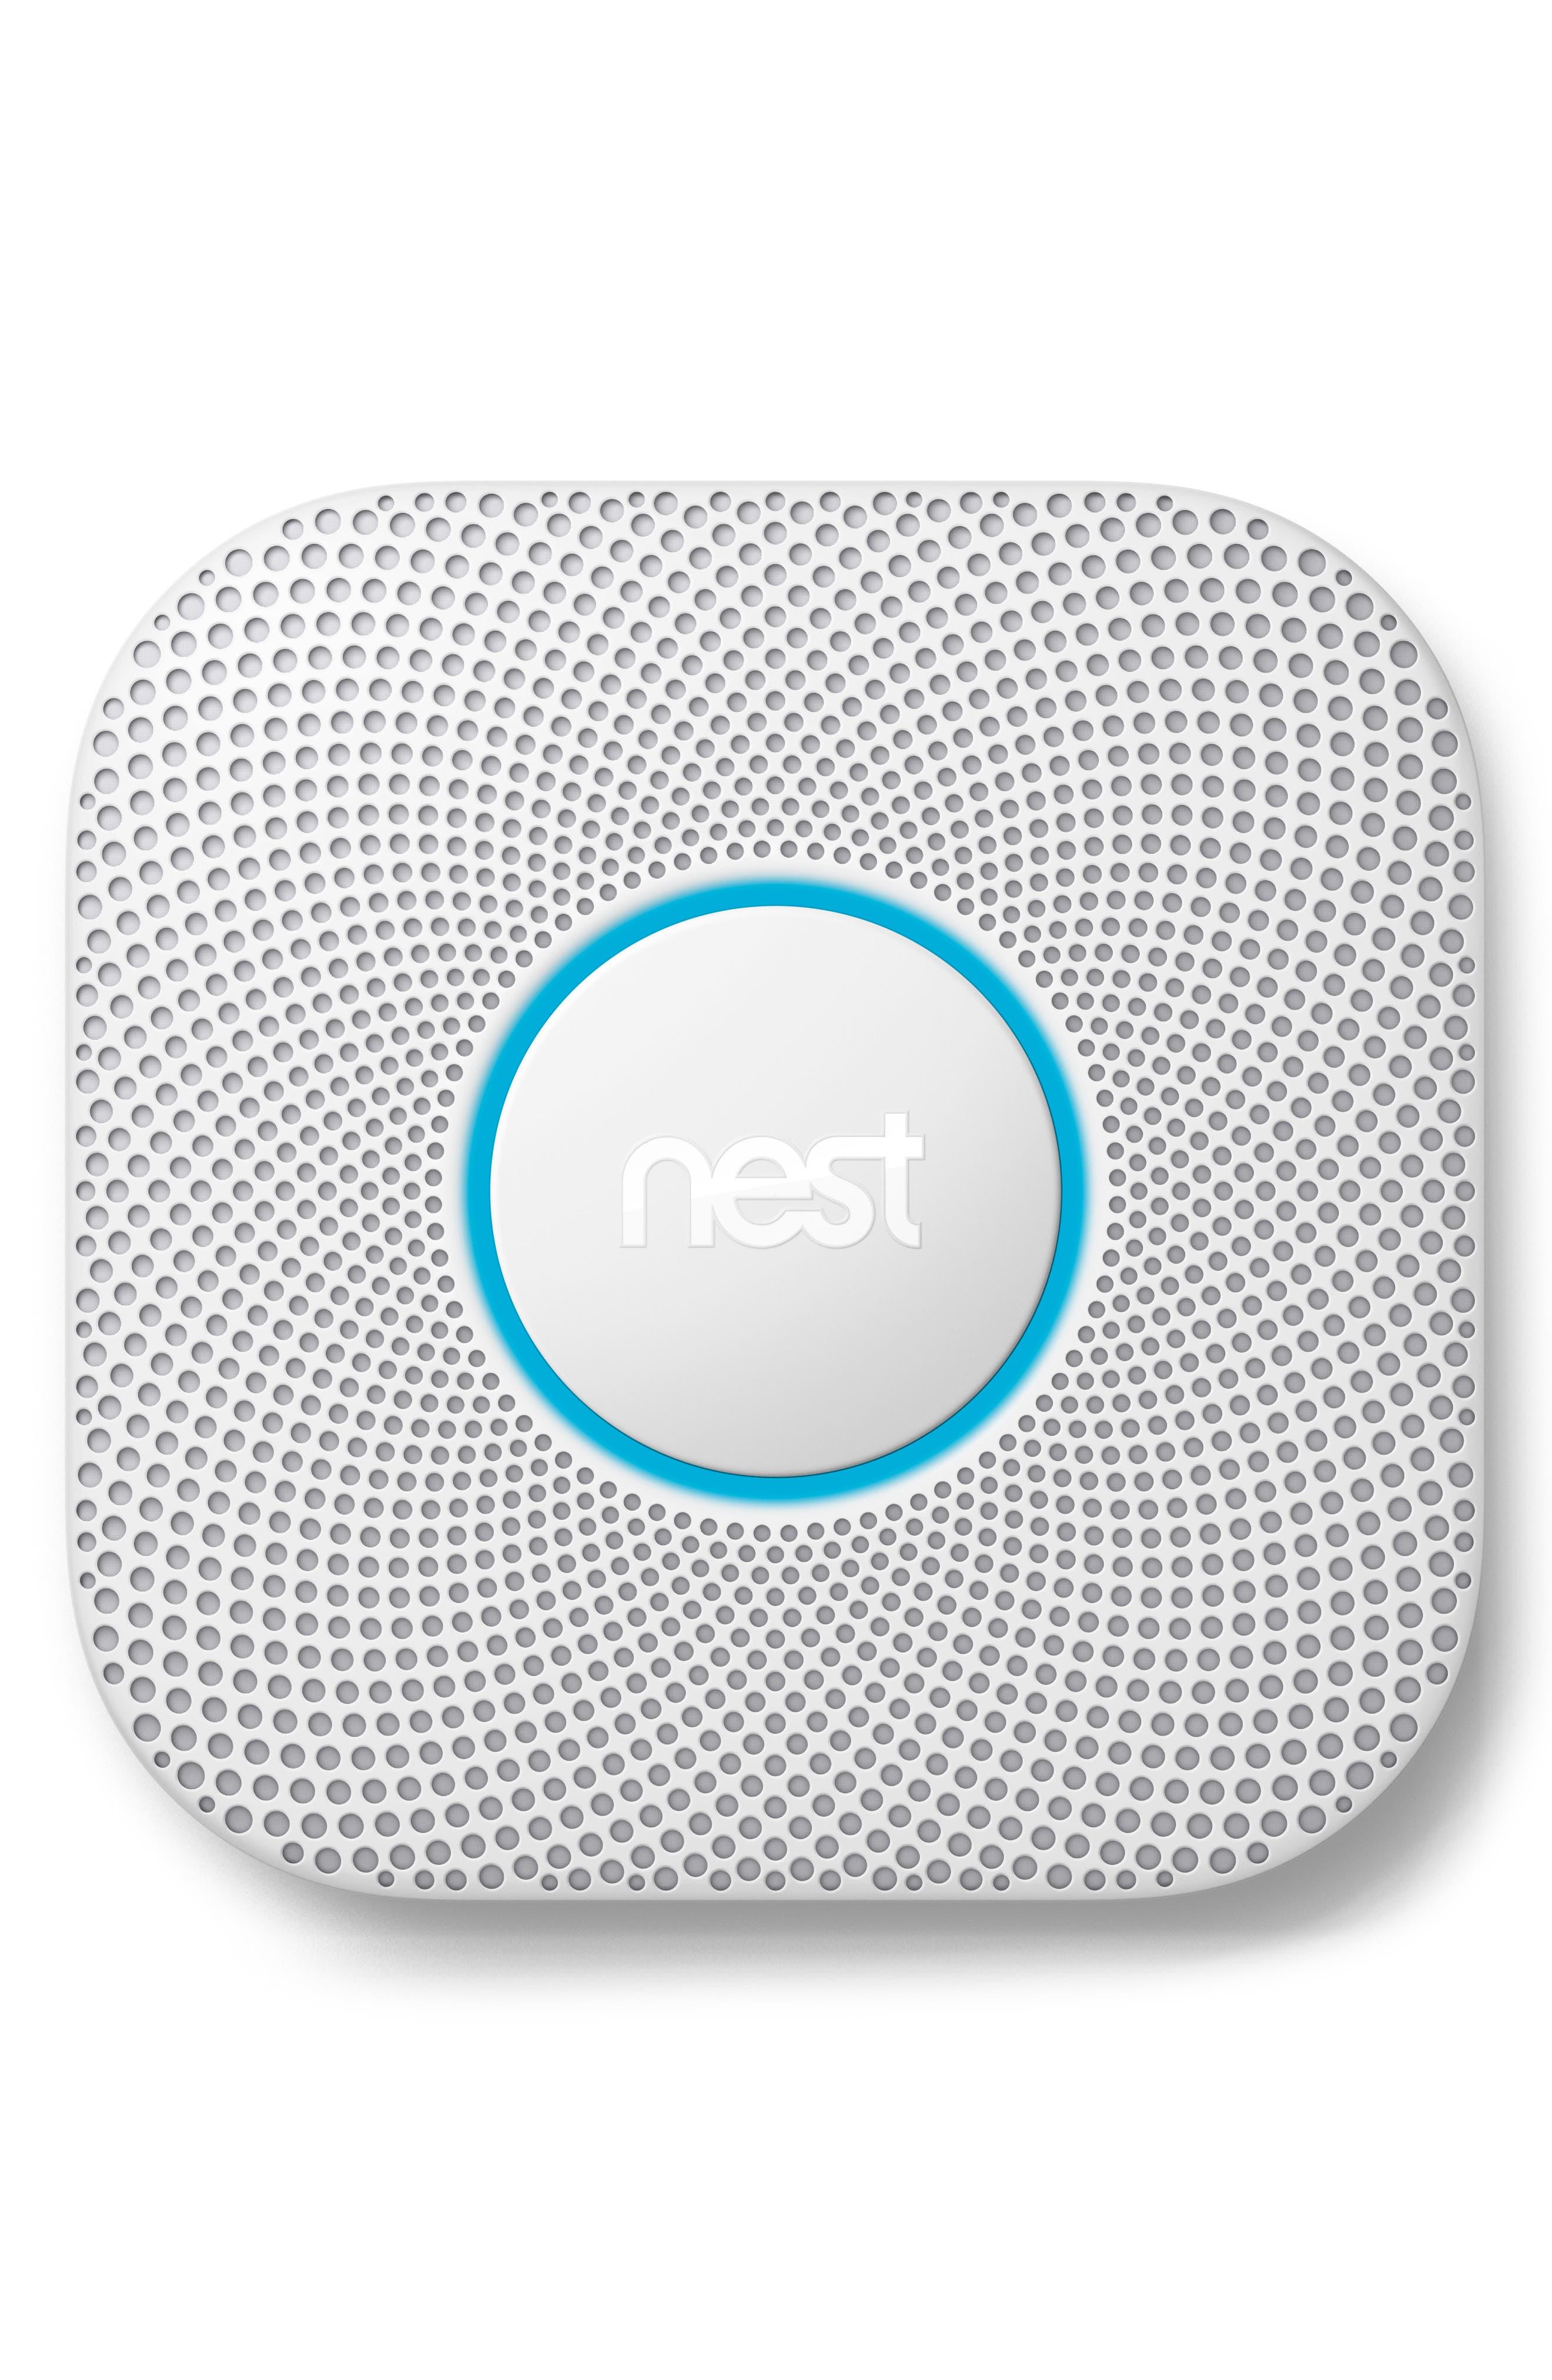 Main Image - Nest Protect Smoke & Carbon Monoxide Alarm